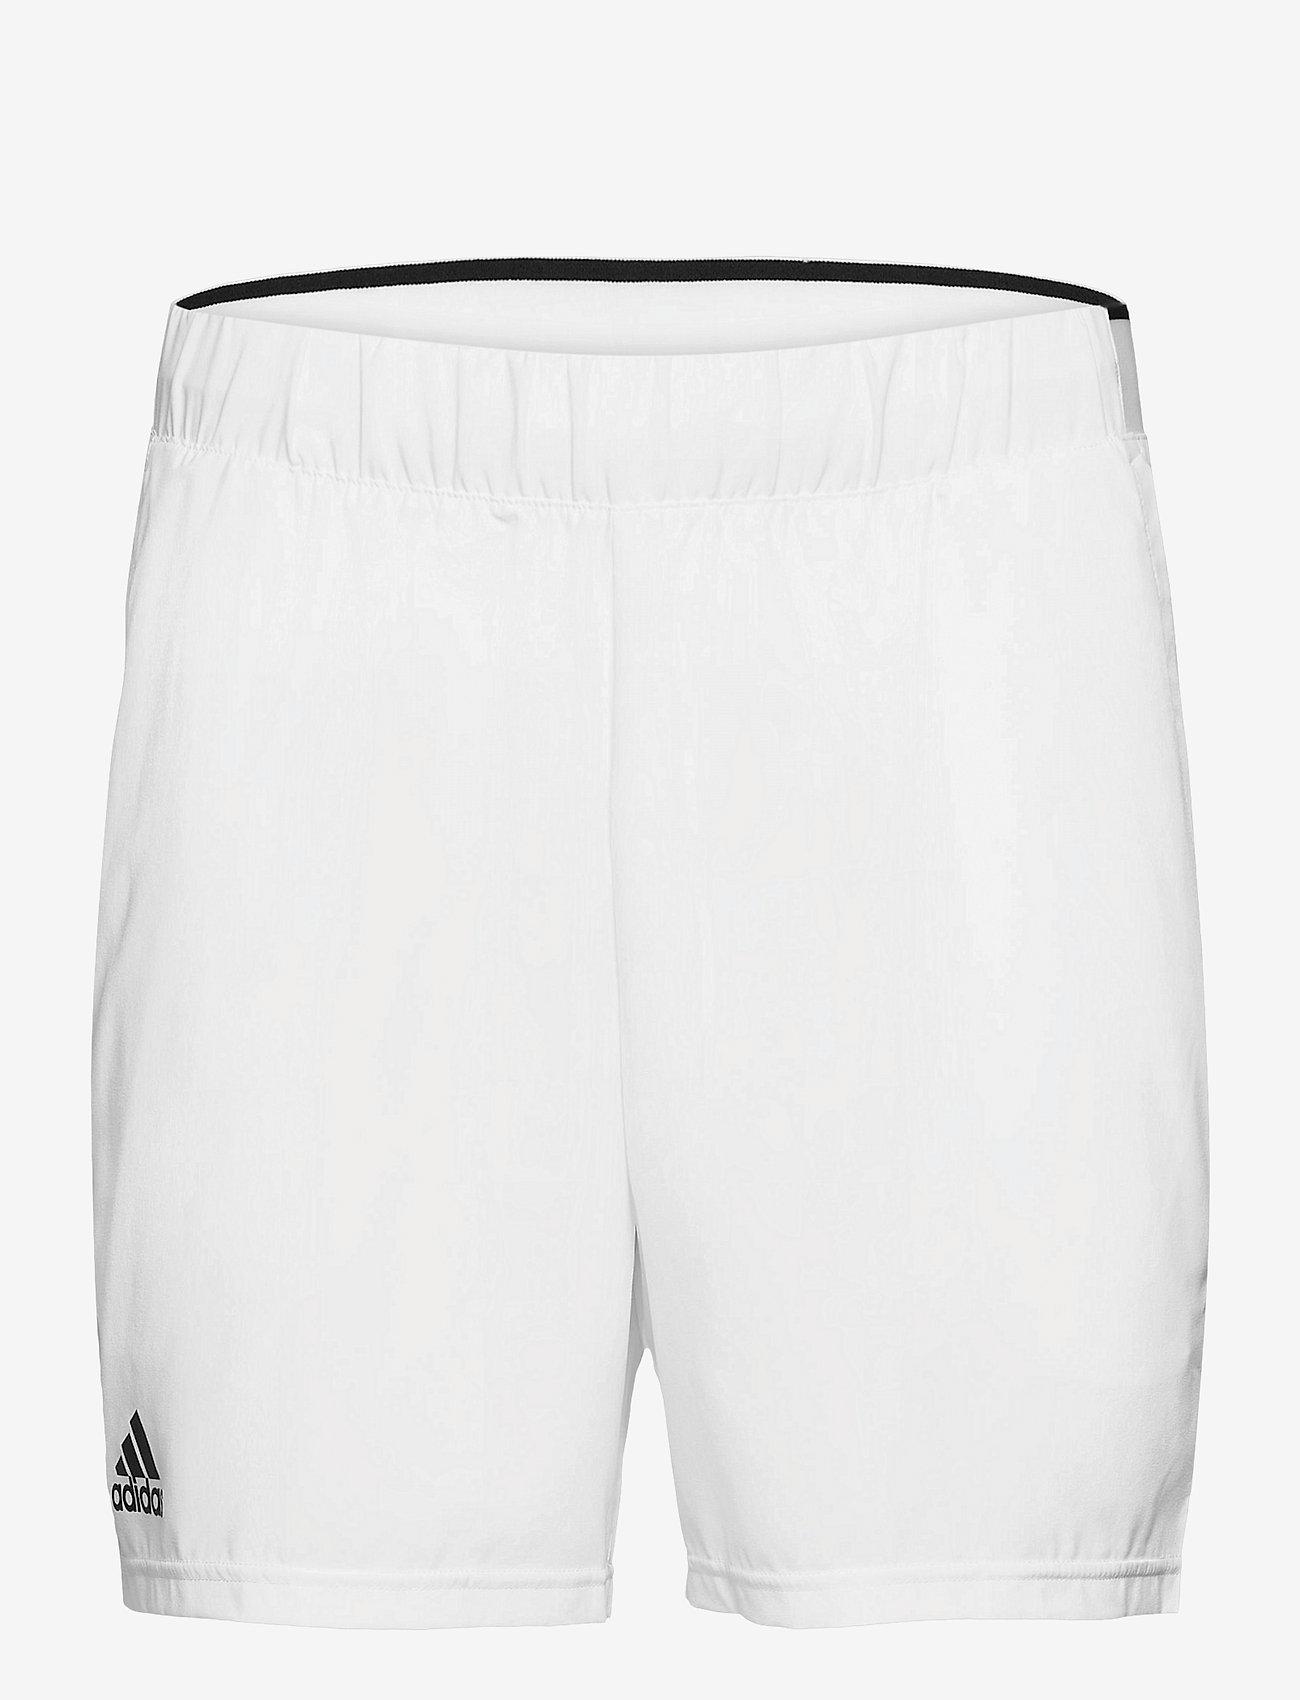 adidas Performance - CLUB STRETCH WOVEN SHORTS - trainingsshorts - white - 1